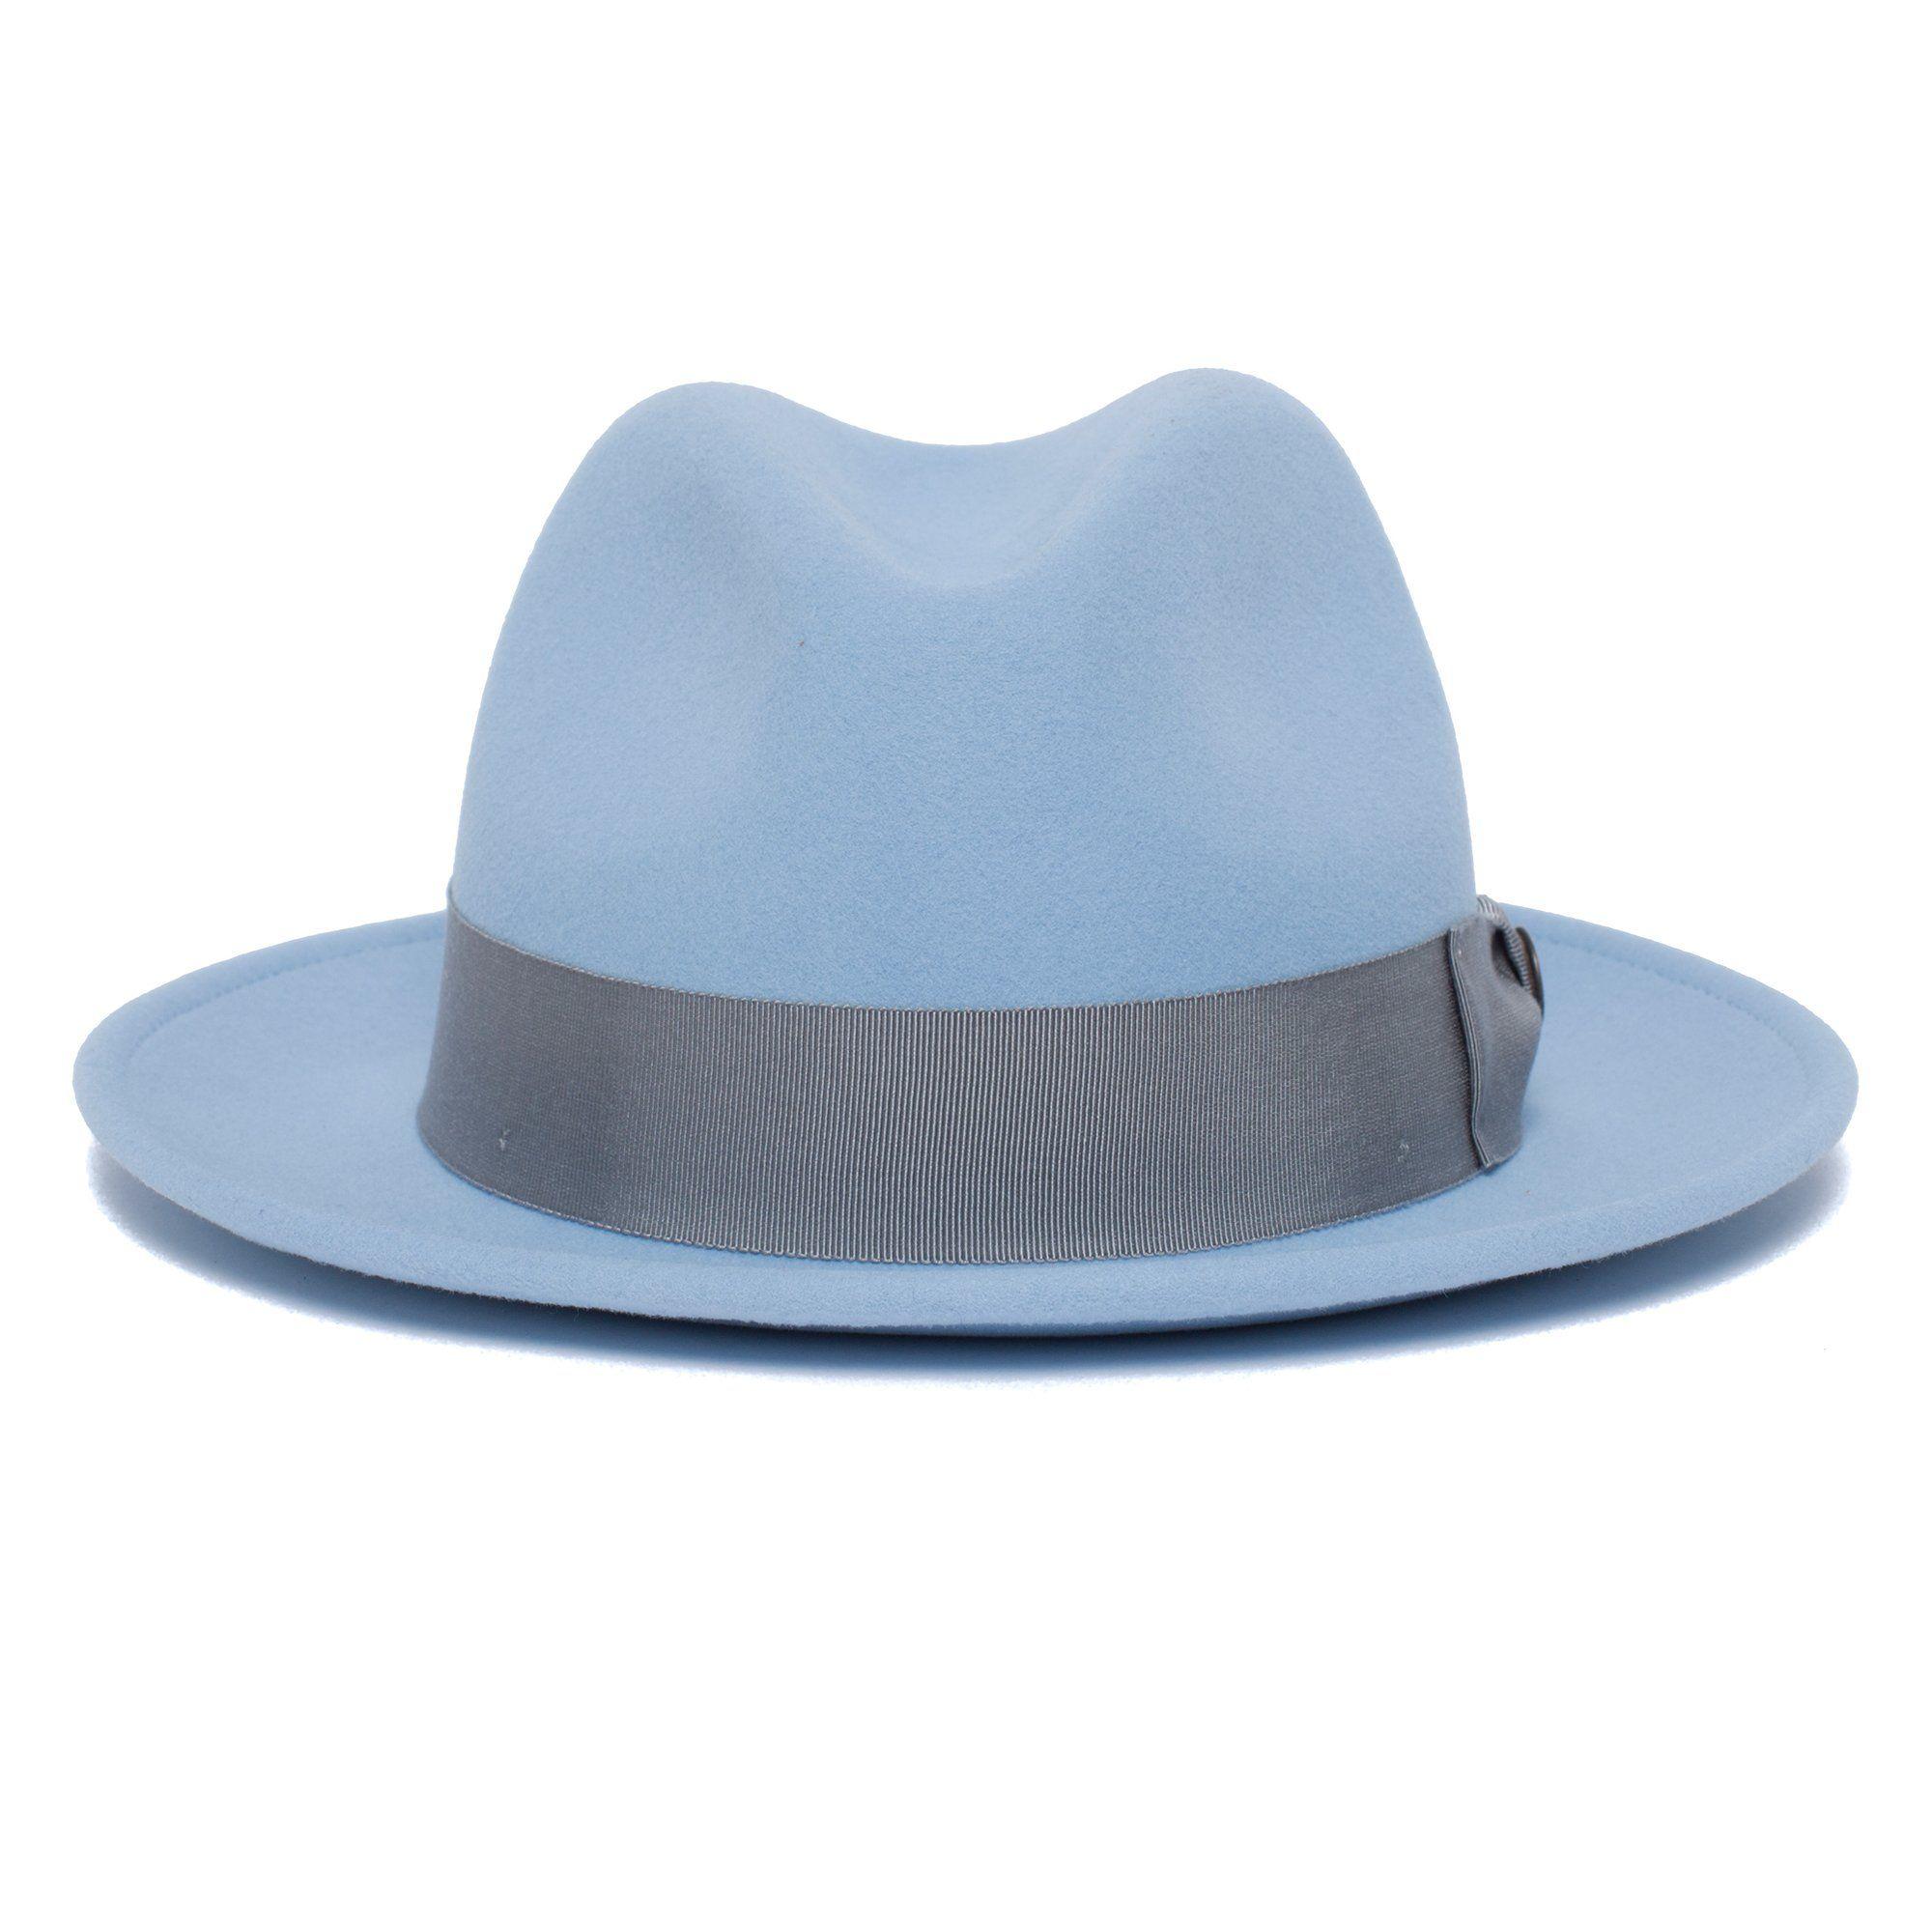 Dean The Butcher In 2020 Fedora Hat Men Outfits Fedora Hat Men Hats For Men